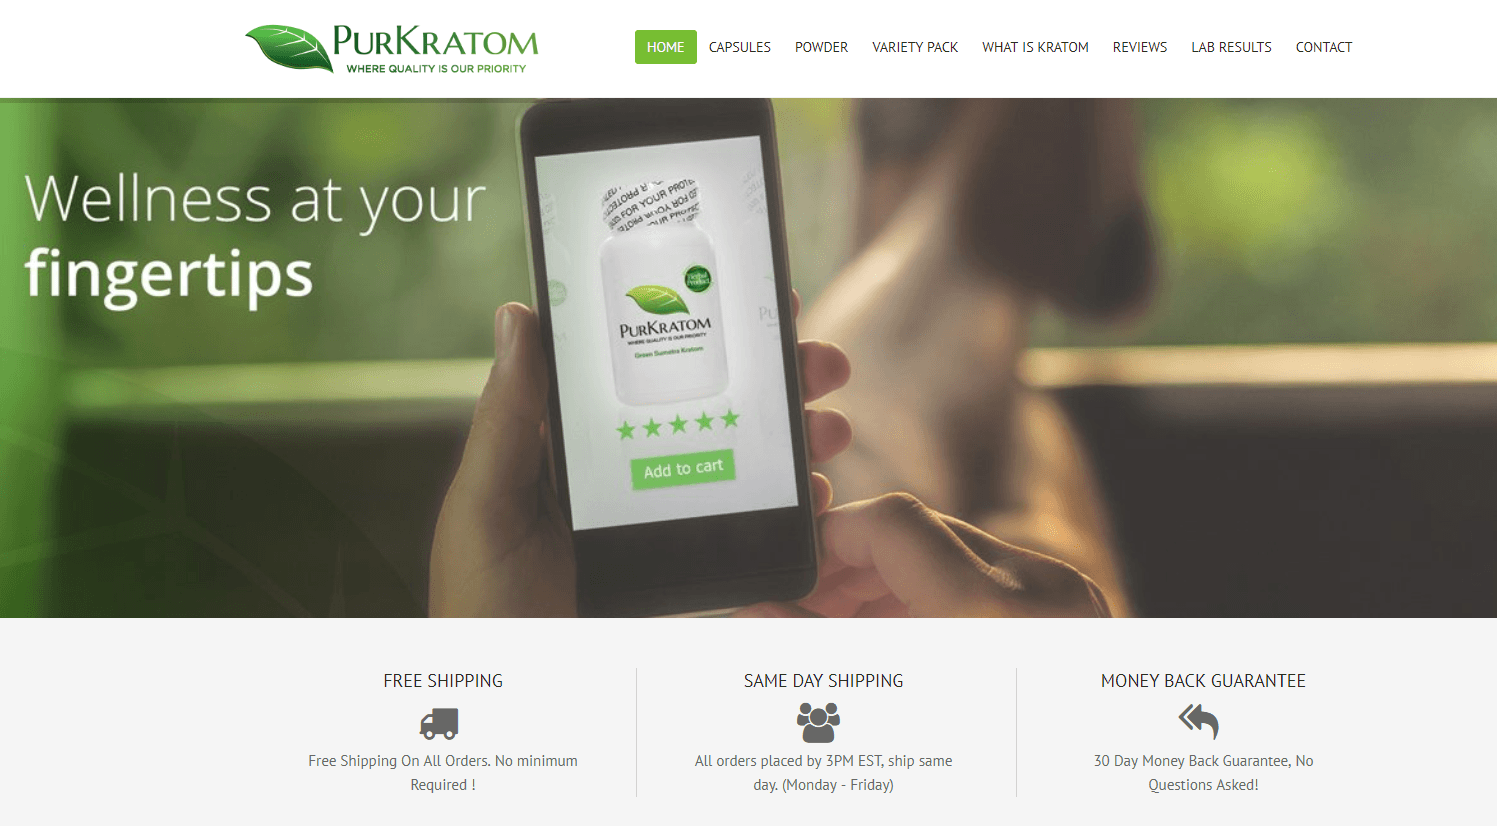 Purkratom reviews